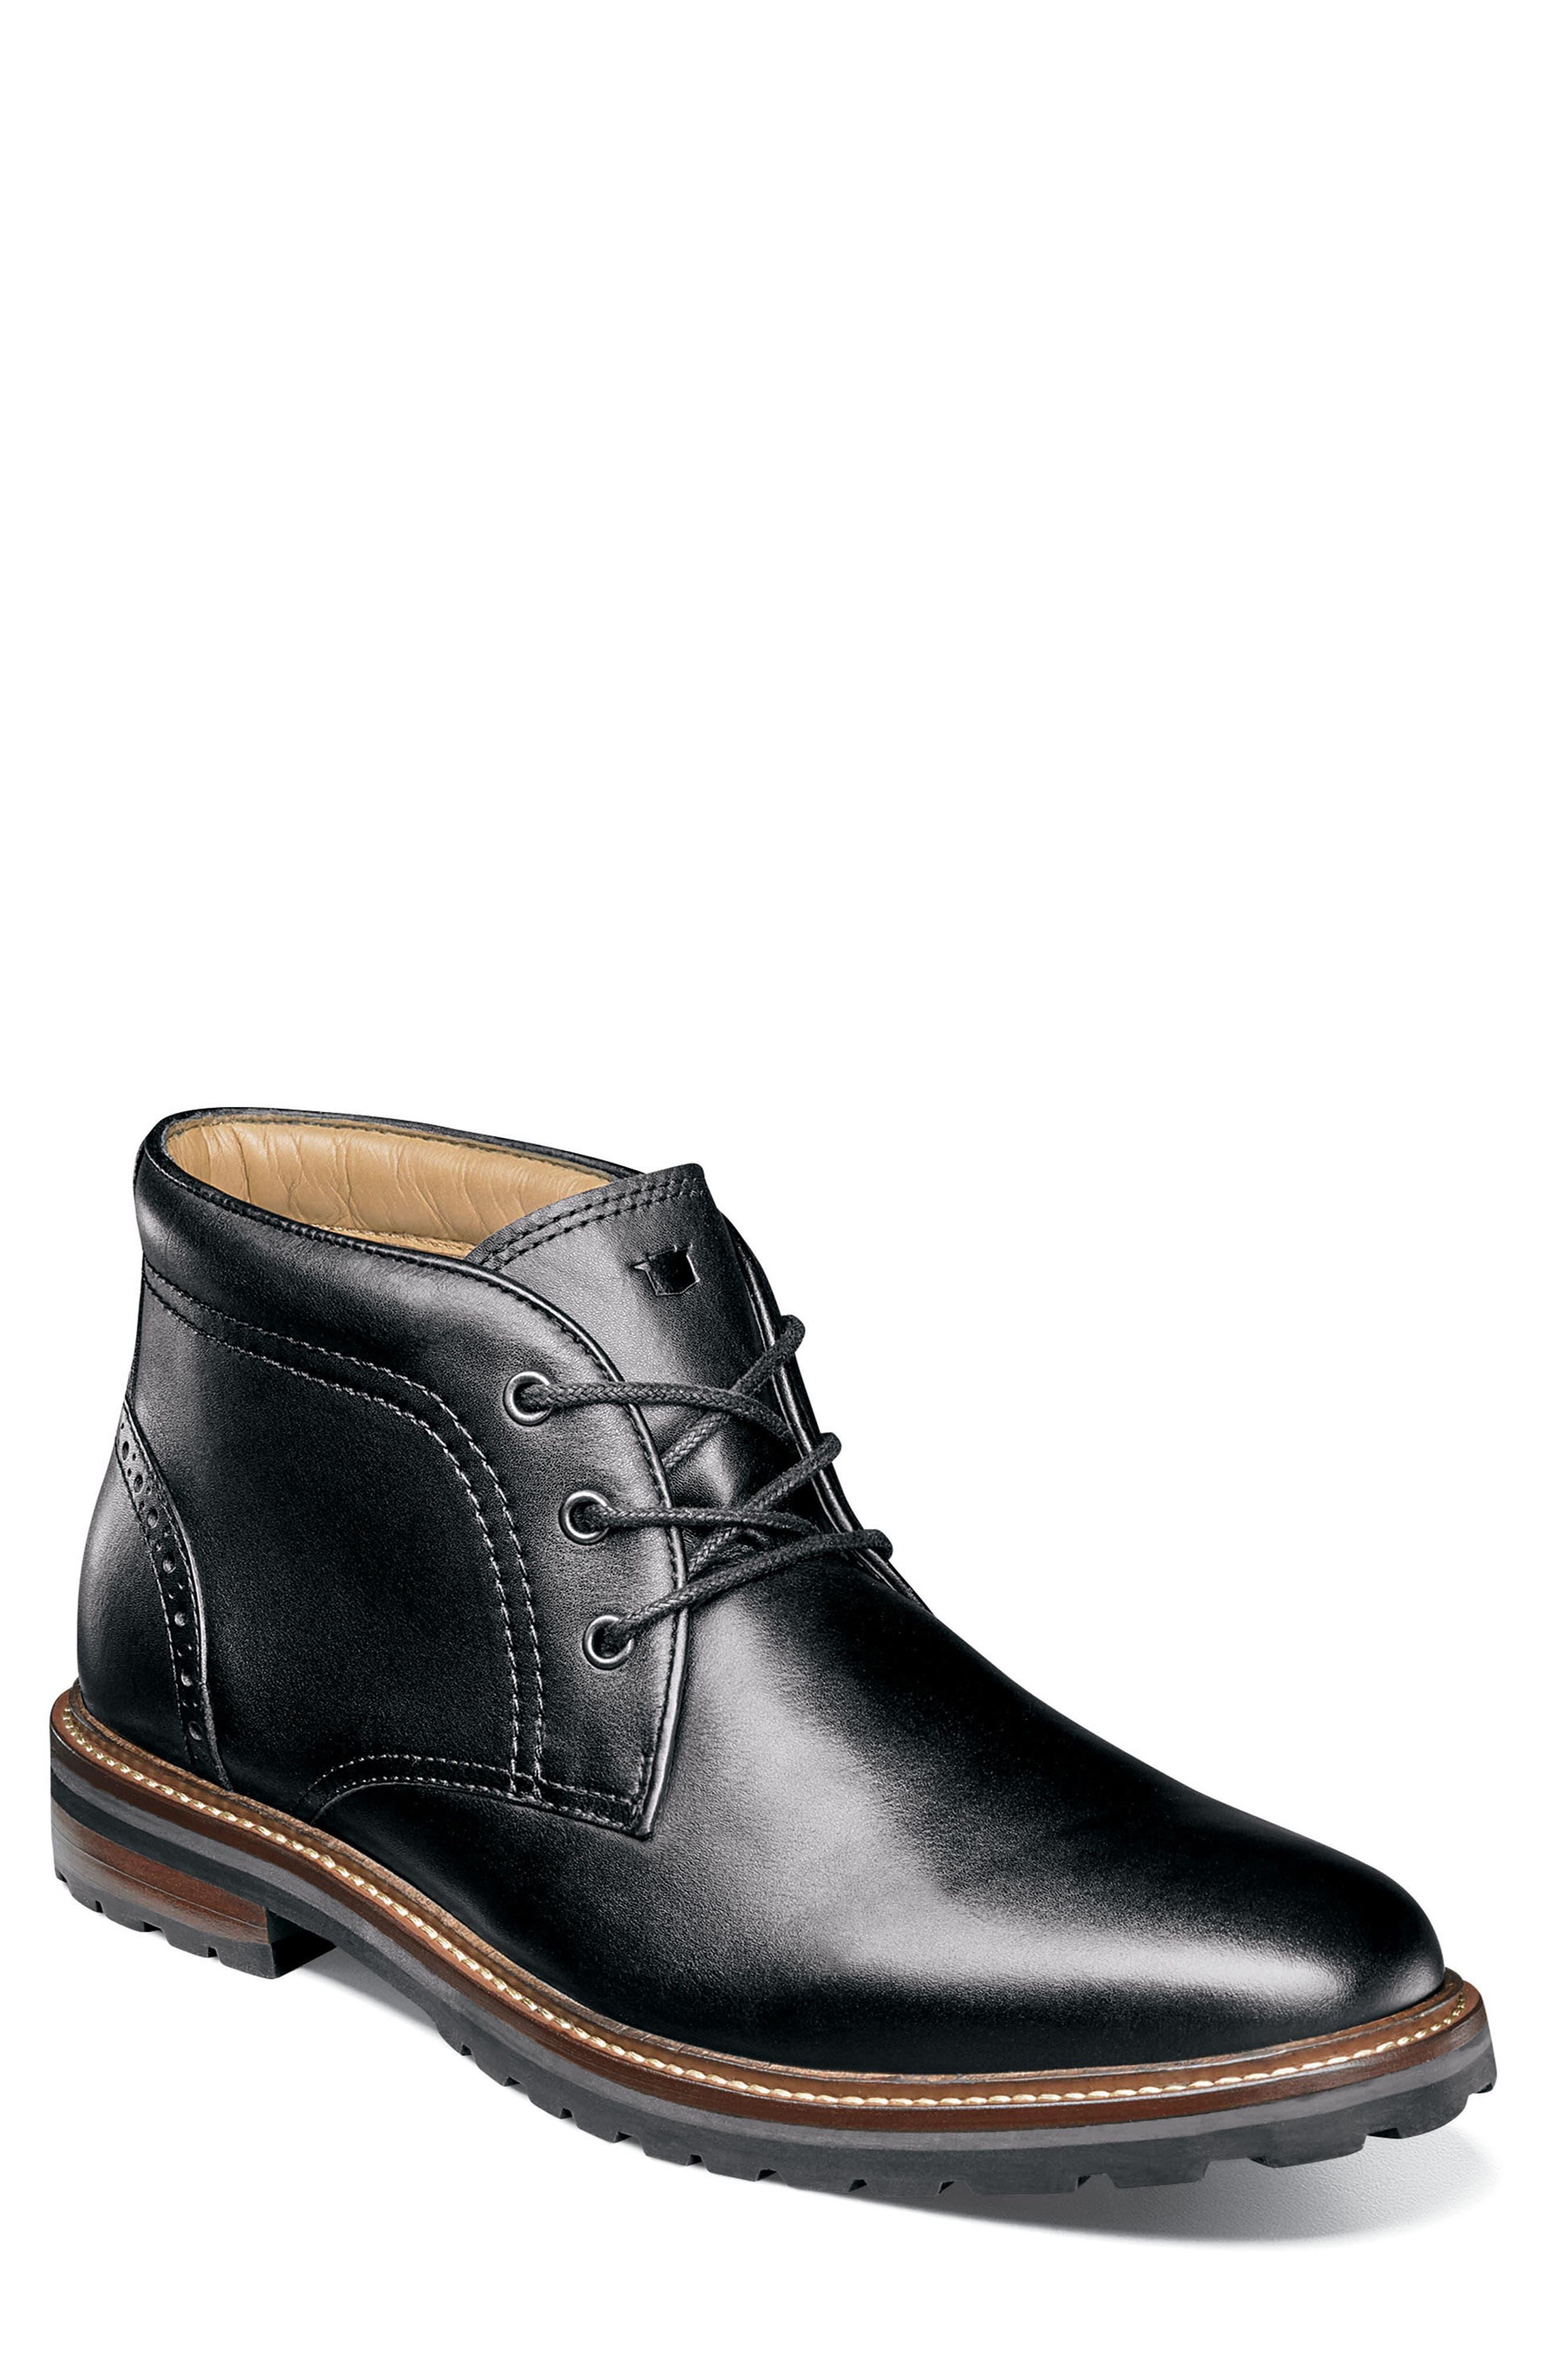 FLORSHEIM Estabrook Lugged Chukka Boot, Main, color, BLACK LEATHER